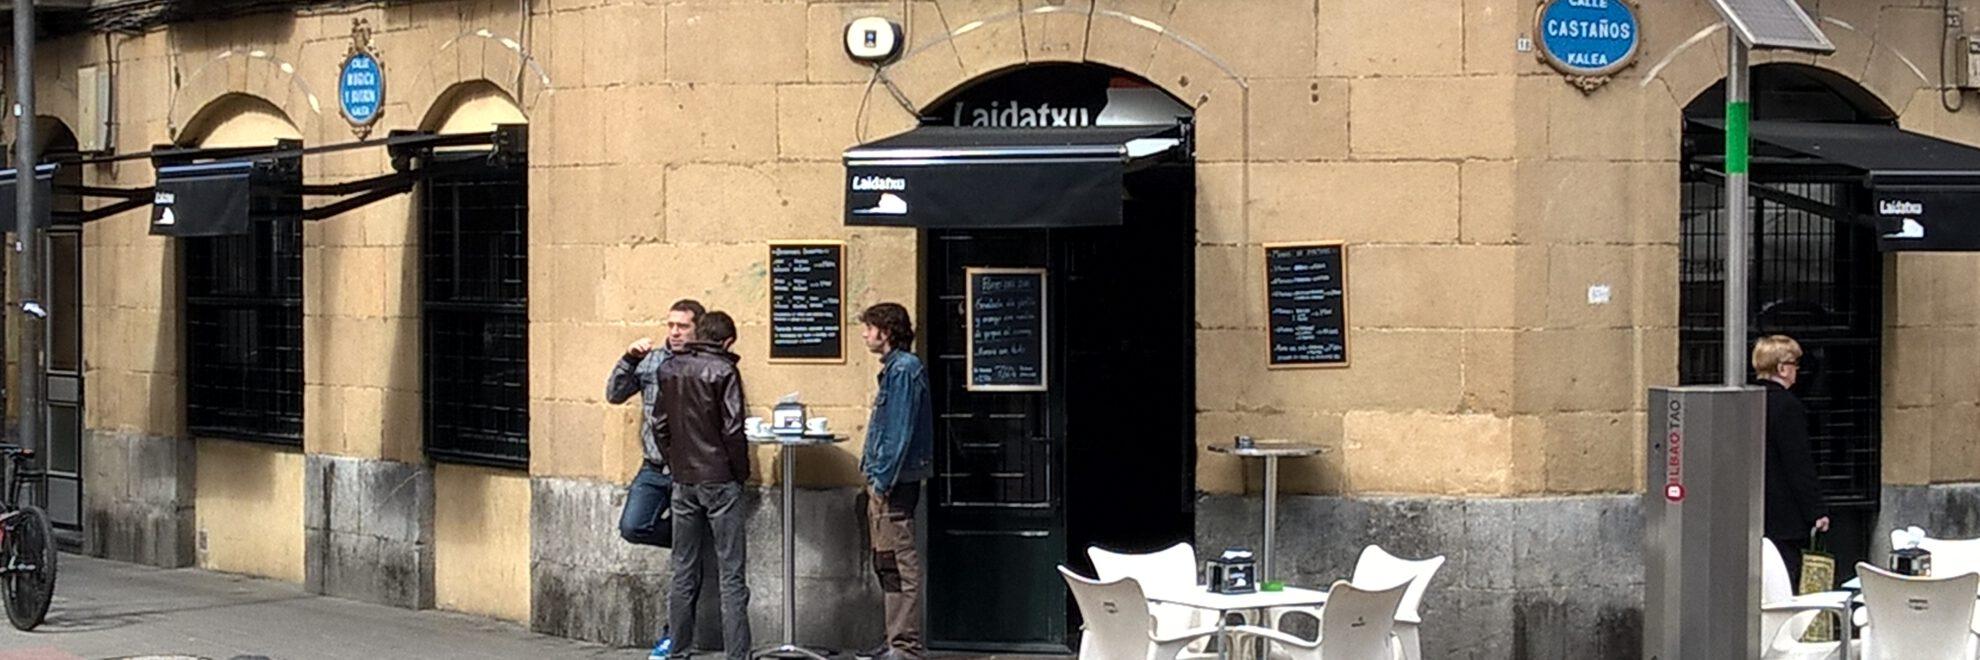 "Bilbao: Bar ""Laidatxu"""